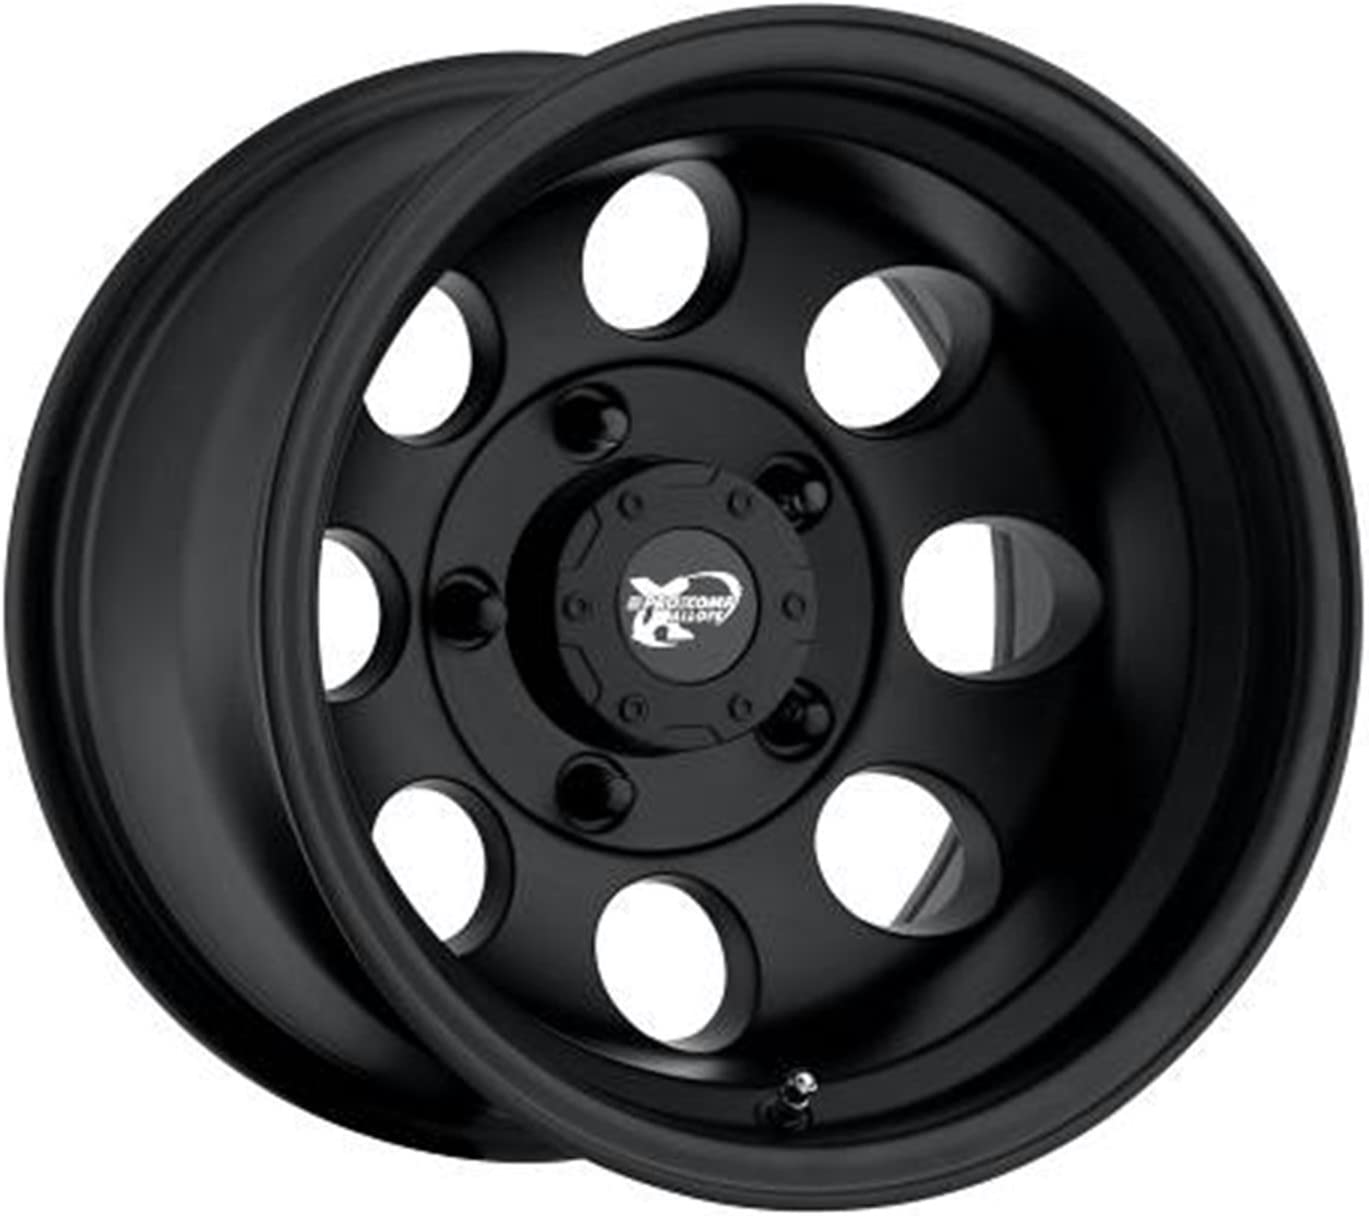 "Pro Comp Alloys Series 69 Wheel with Flat Black Finish (15x8""/5x114.3mm)"